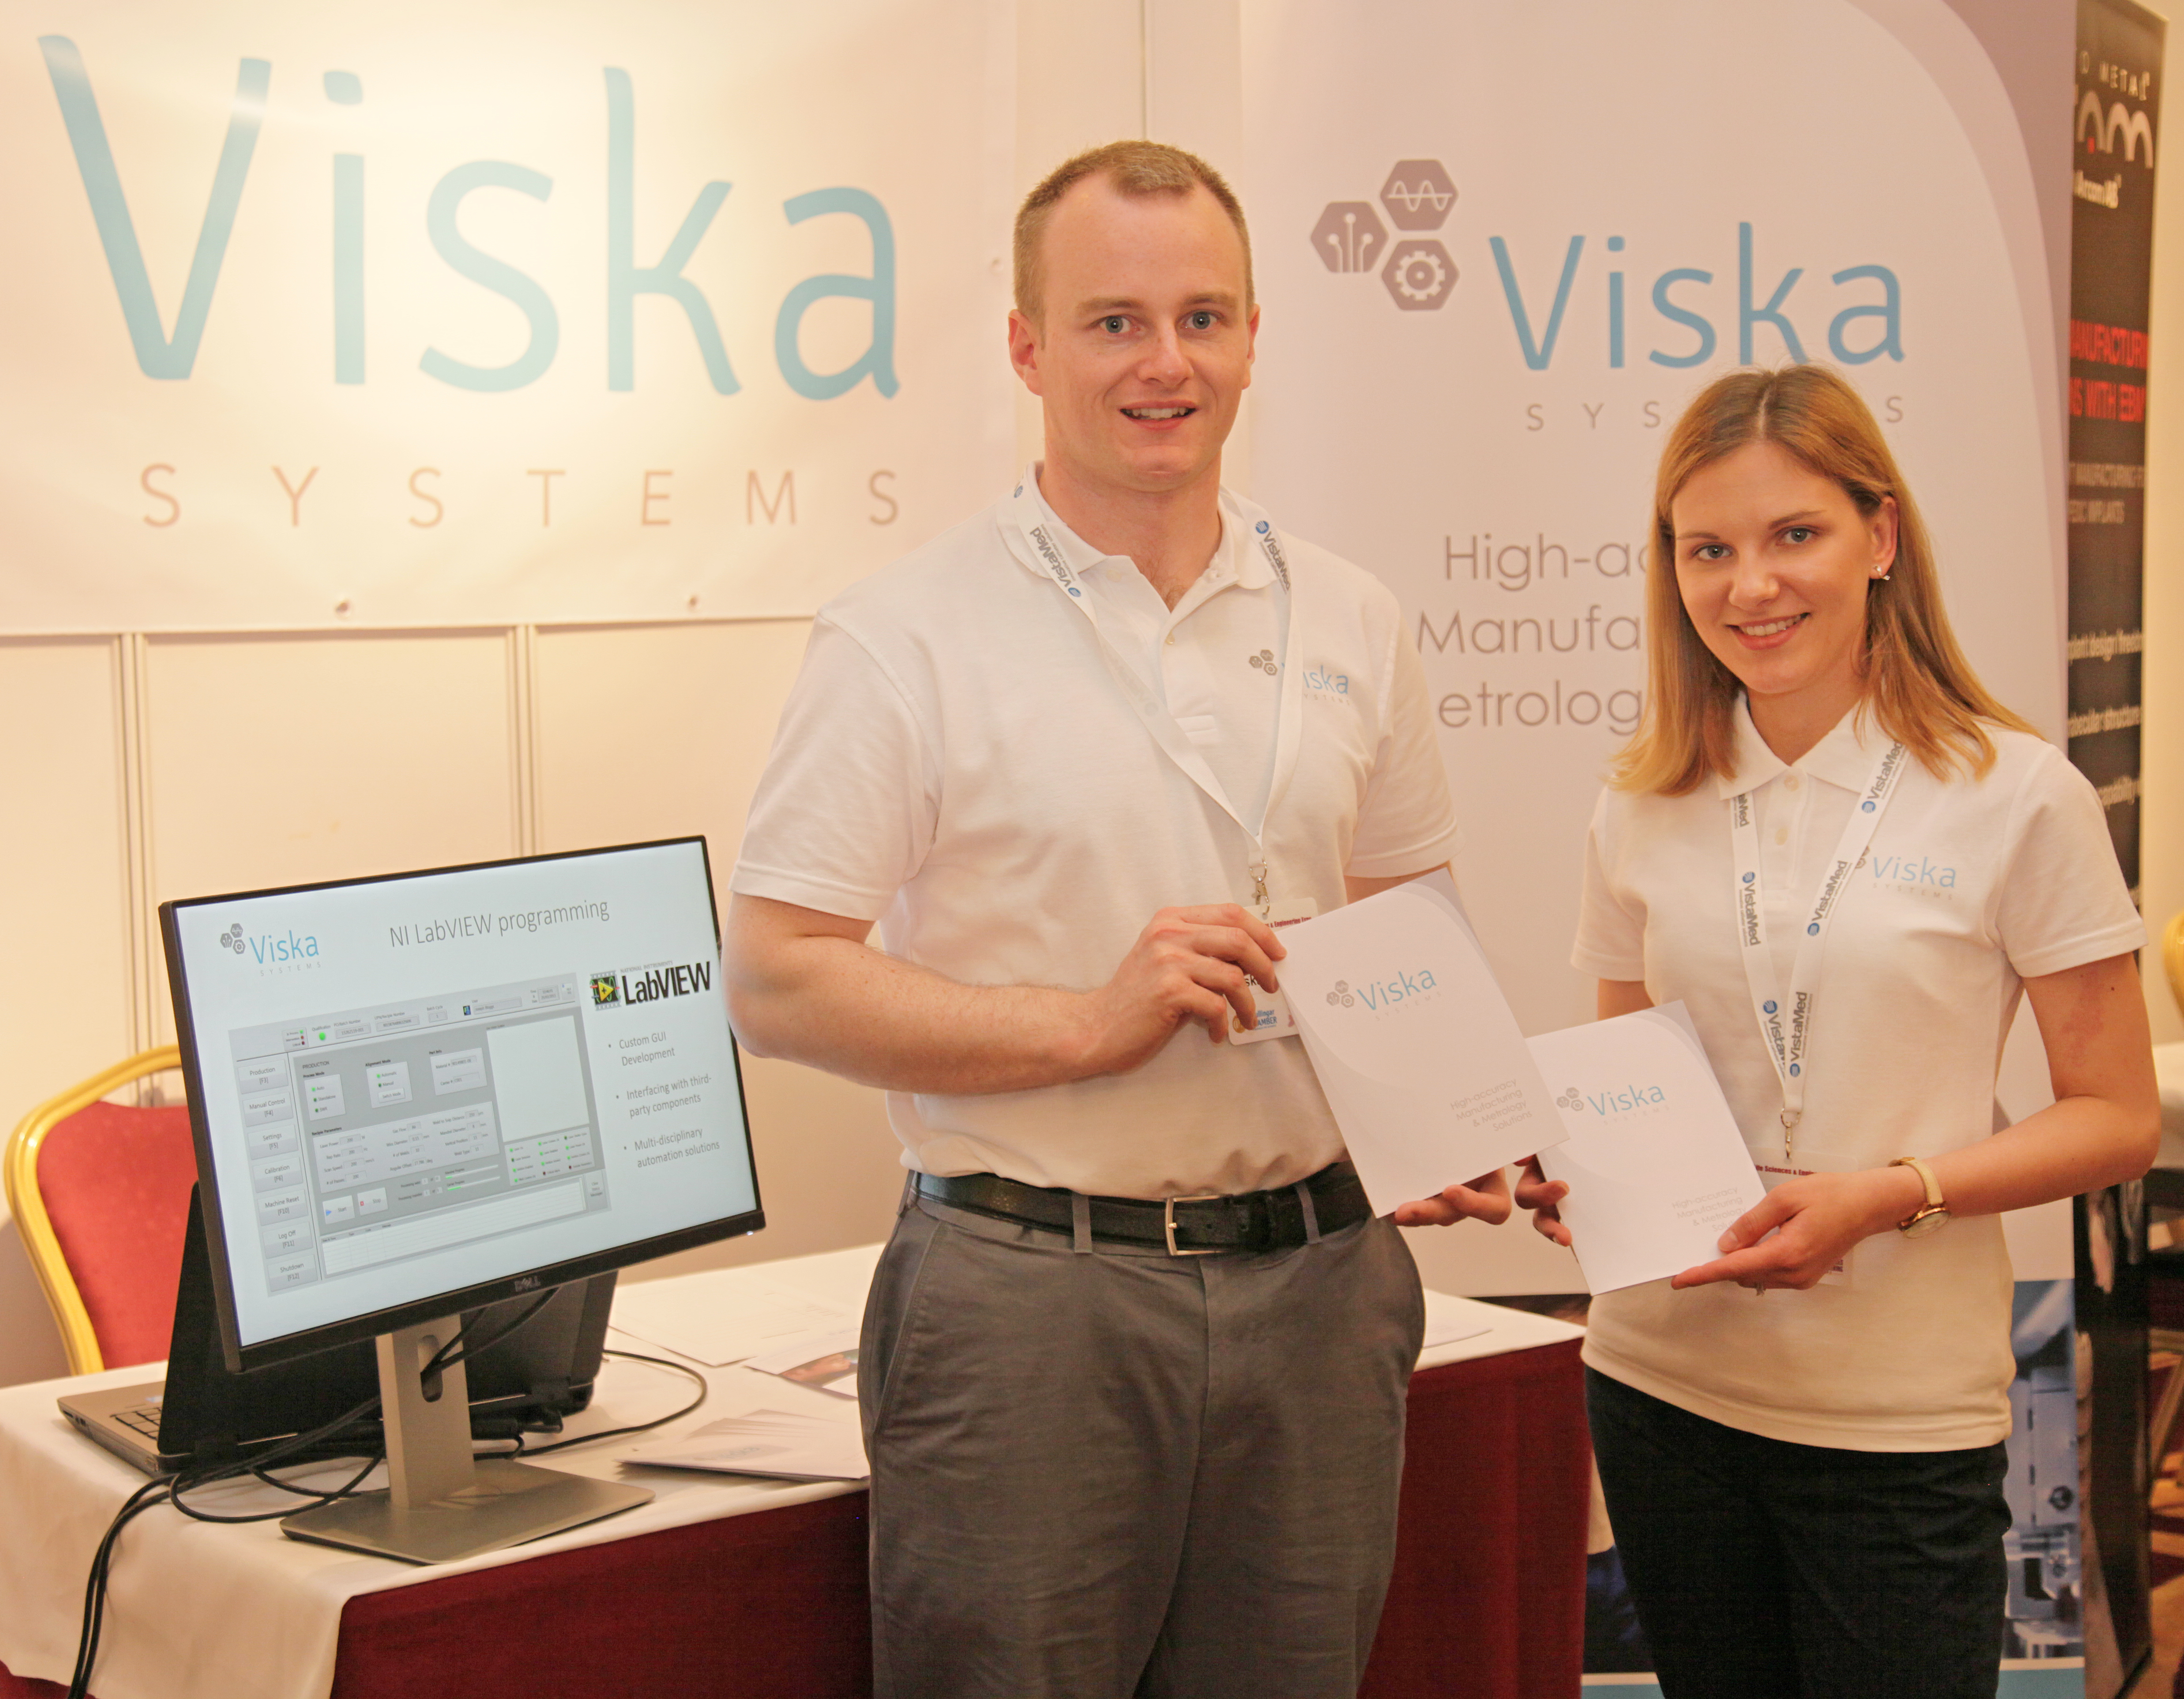 Viska Systems at the Life Science & Engineering Expo 2016